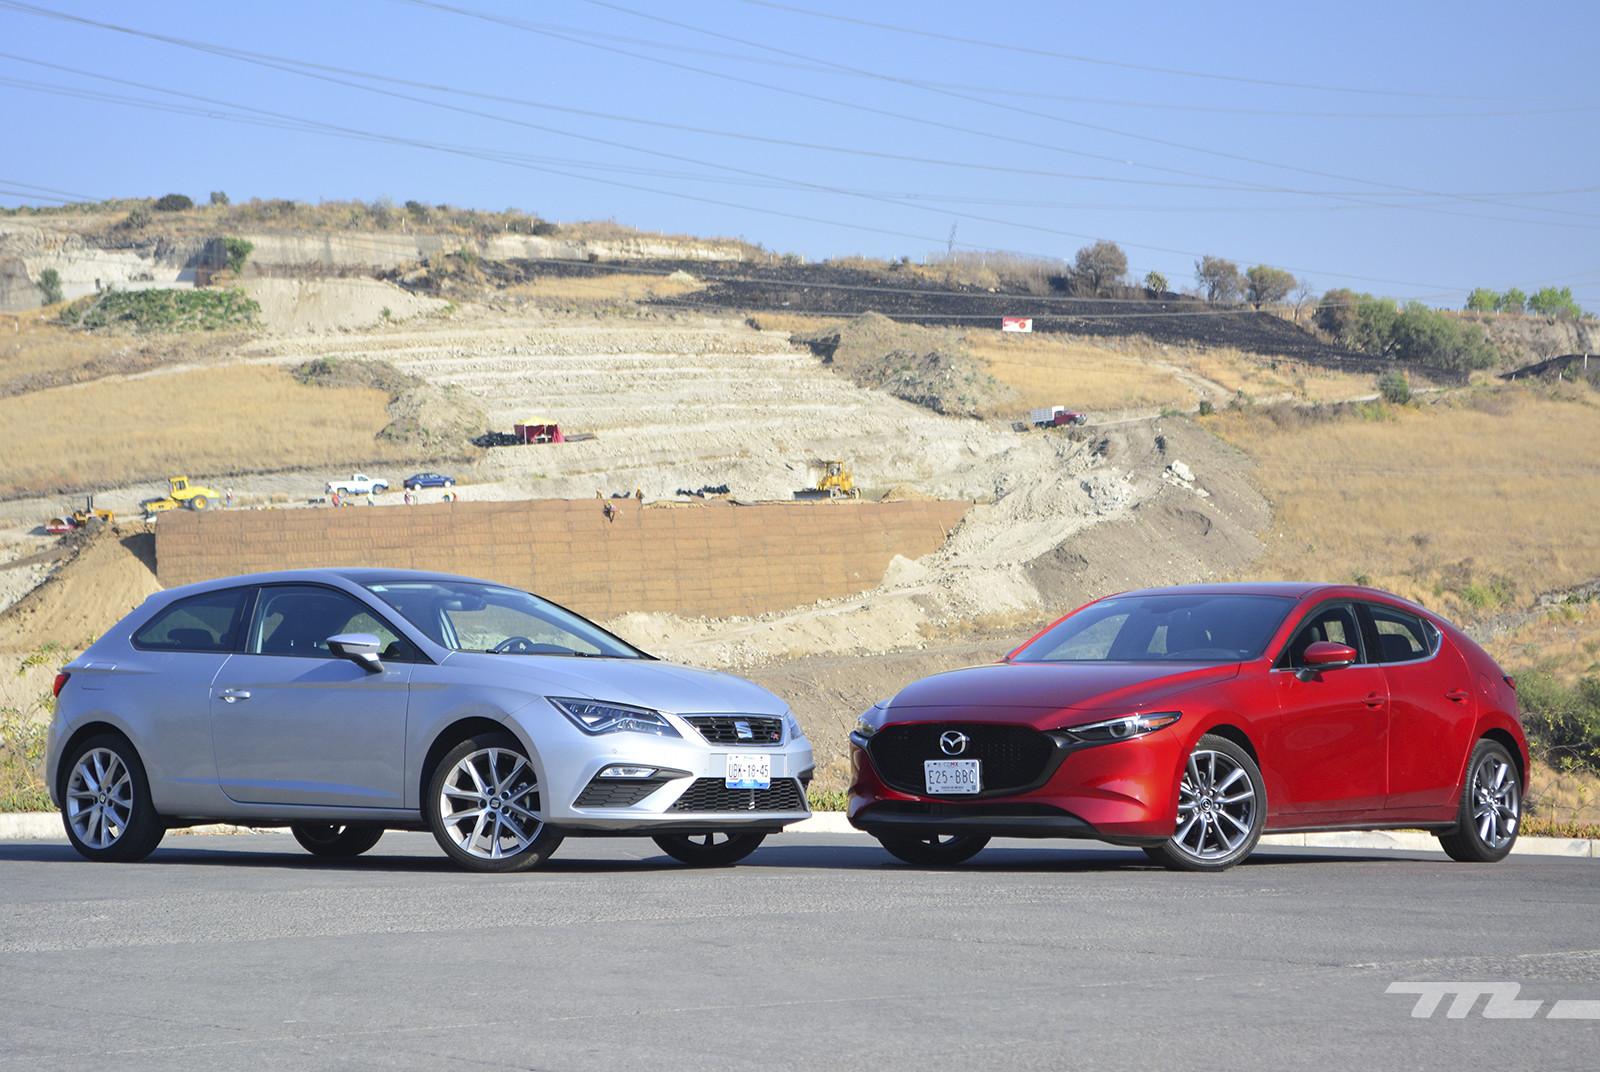 Foto de Mazda 3 vs. SEAT León (comparativa) (7/28)